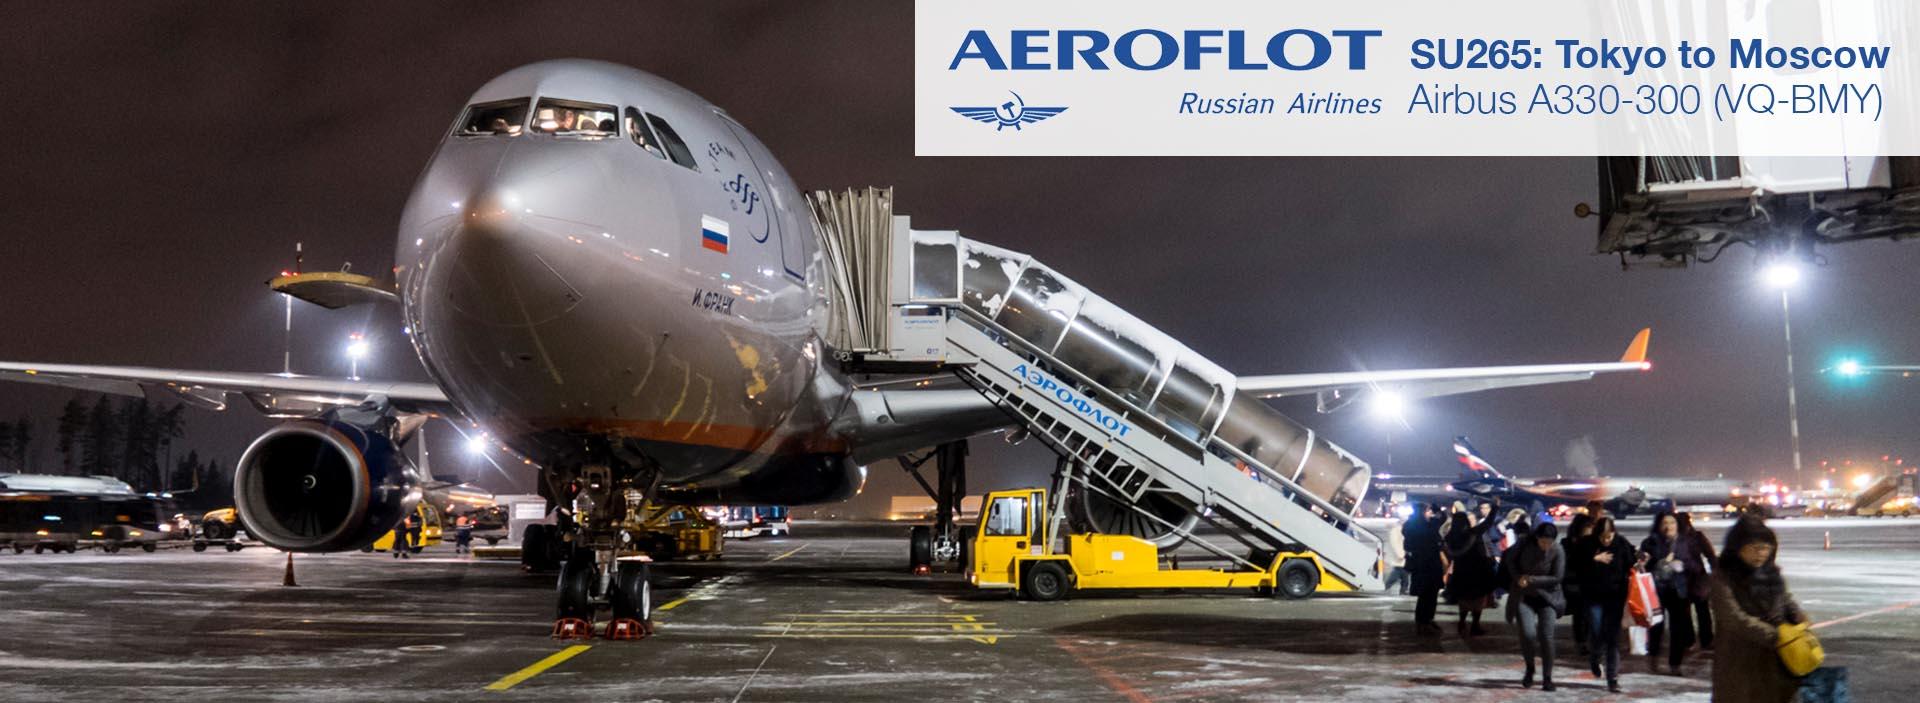 Review: Aeroflot A330-300 Economy Class from Tokyo Narita to Vienna